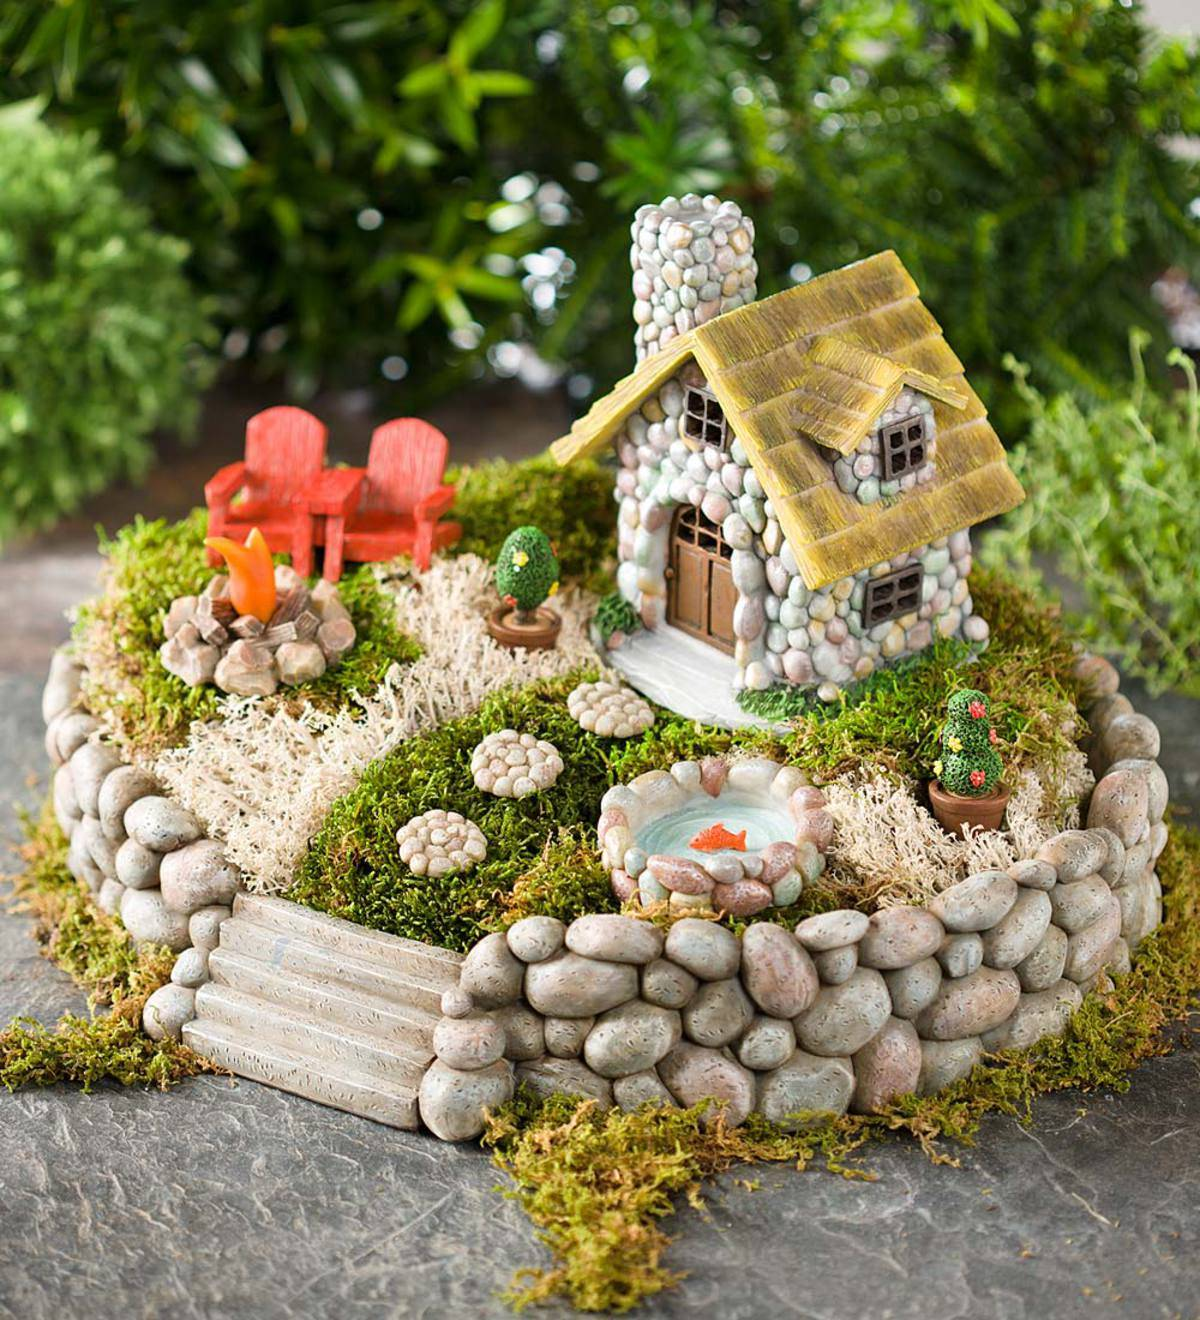 Miniature fairy garden with pebbles